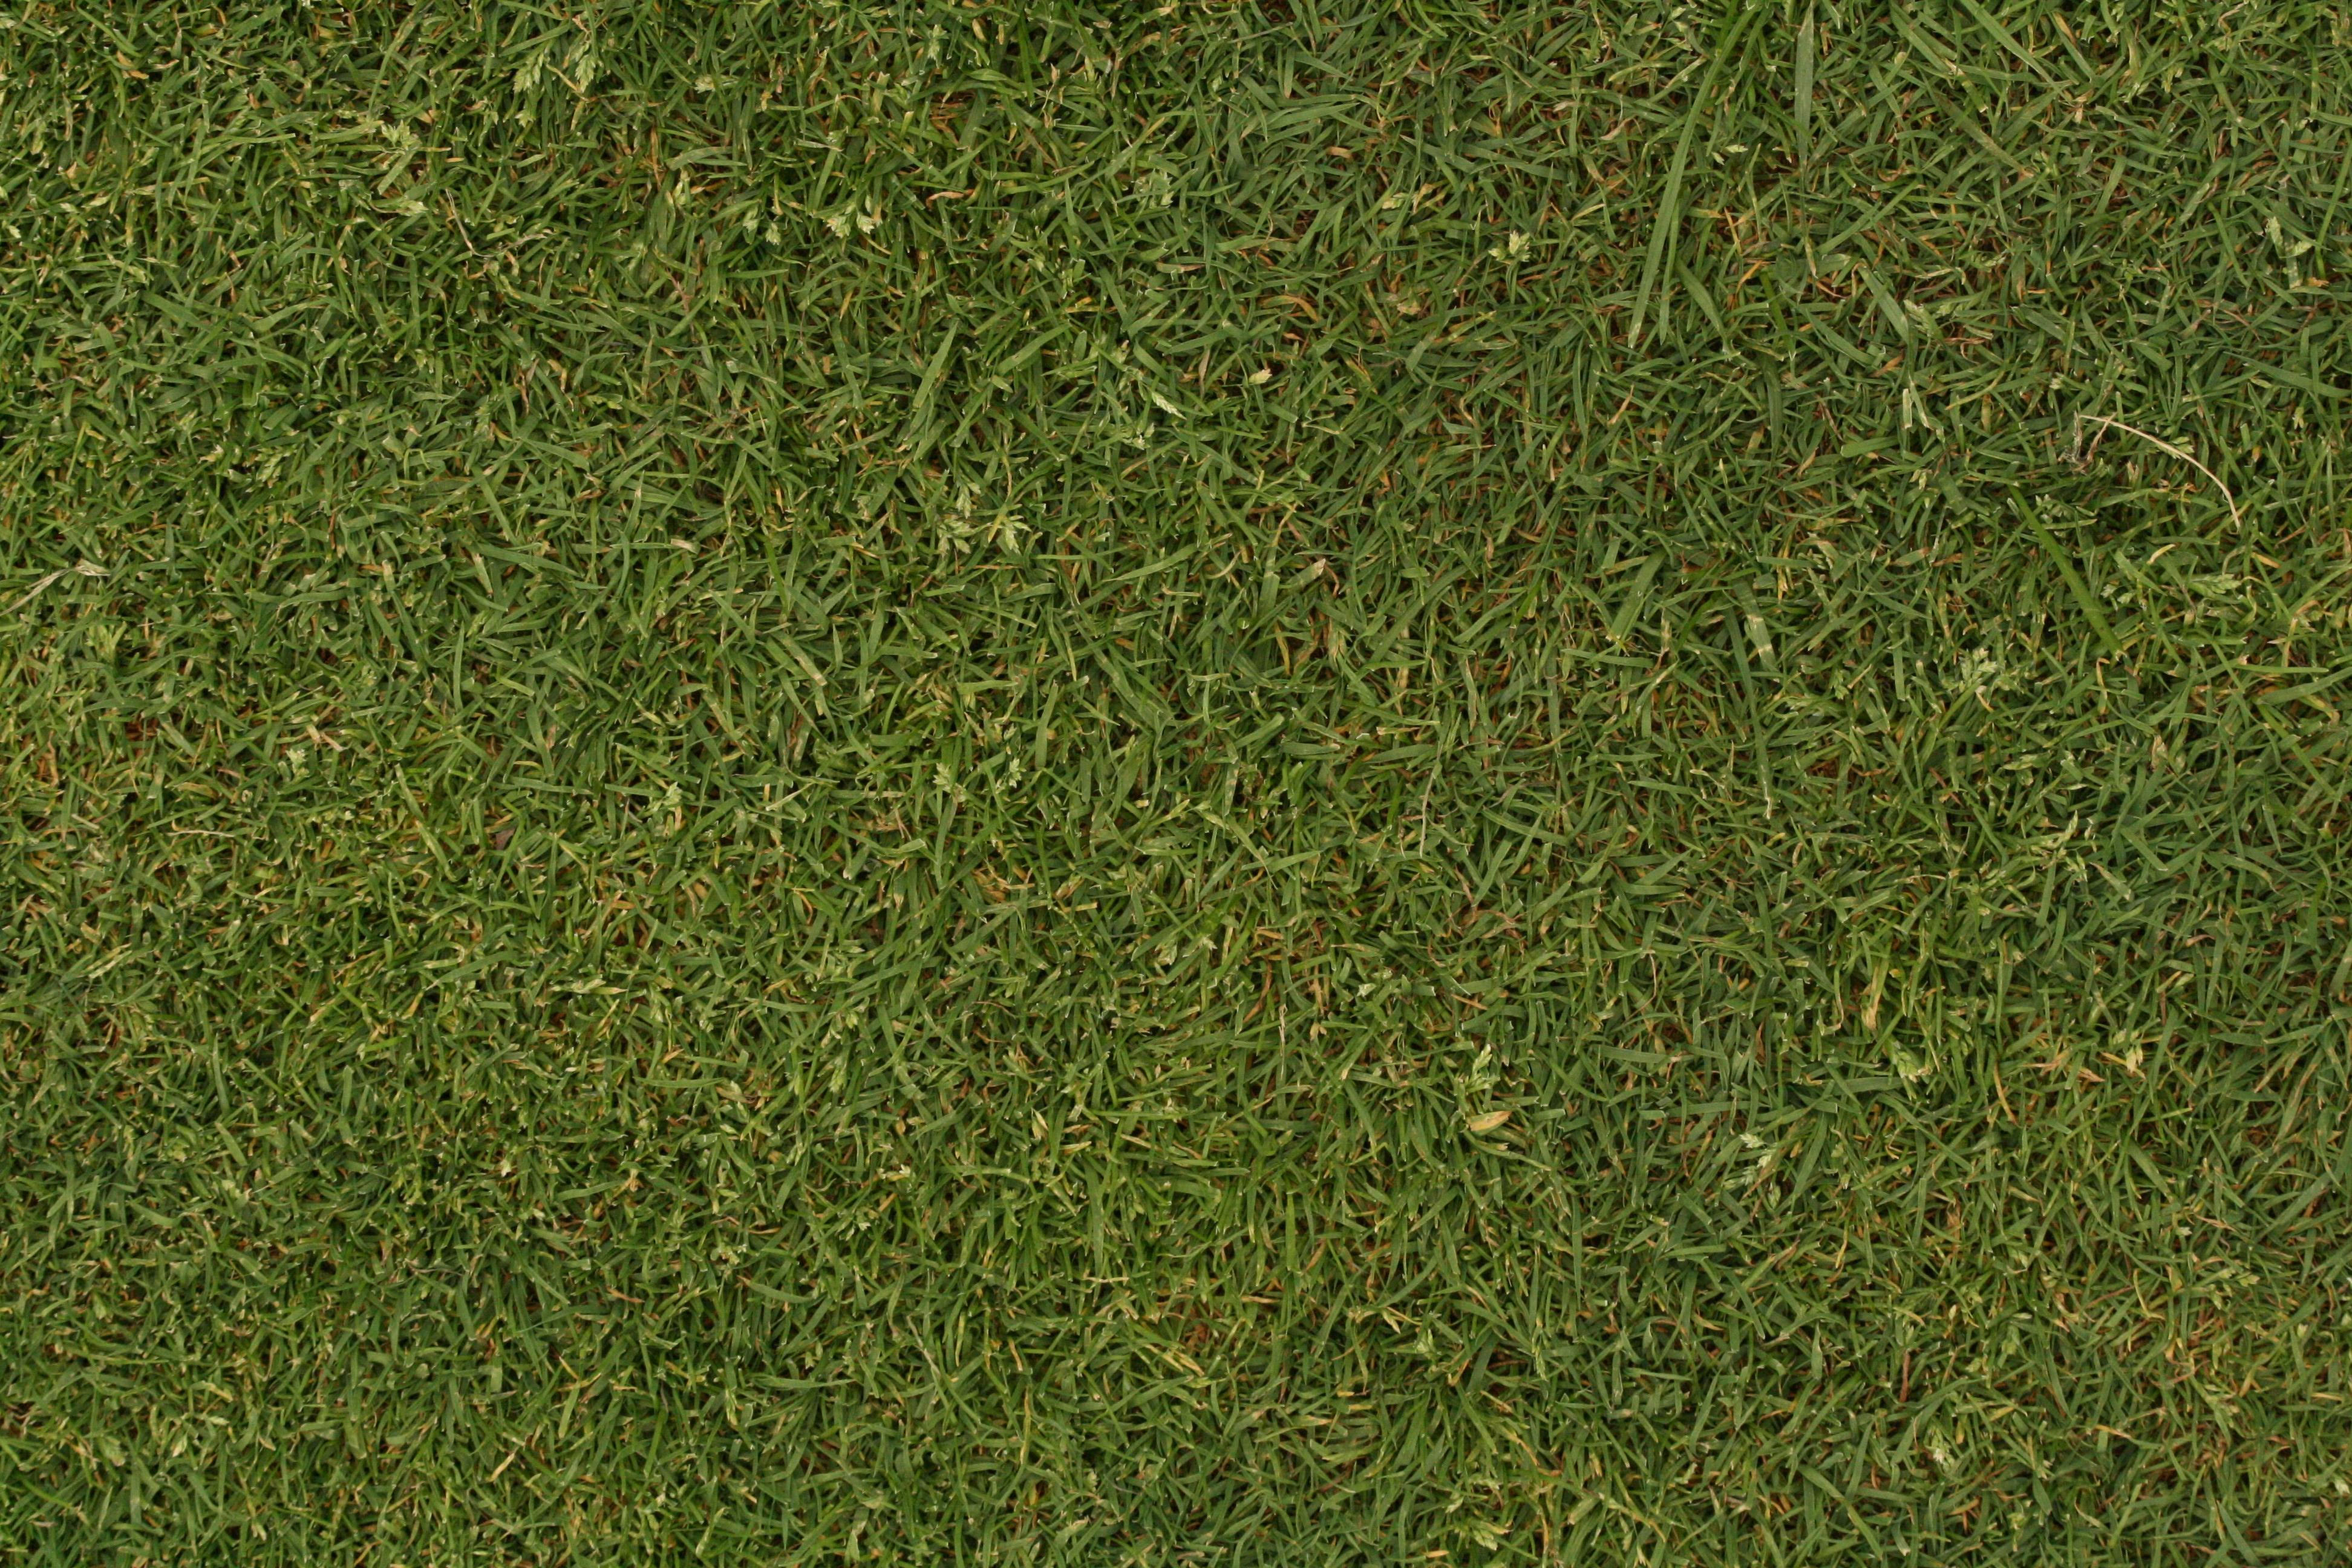 Grass Textures | Texturemate.com